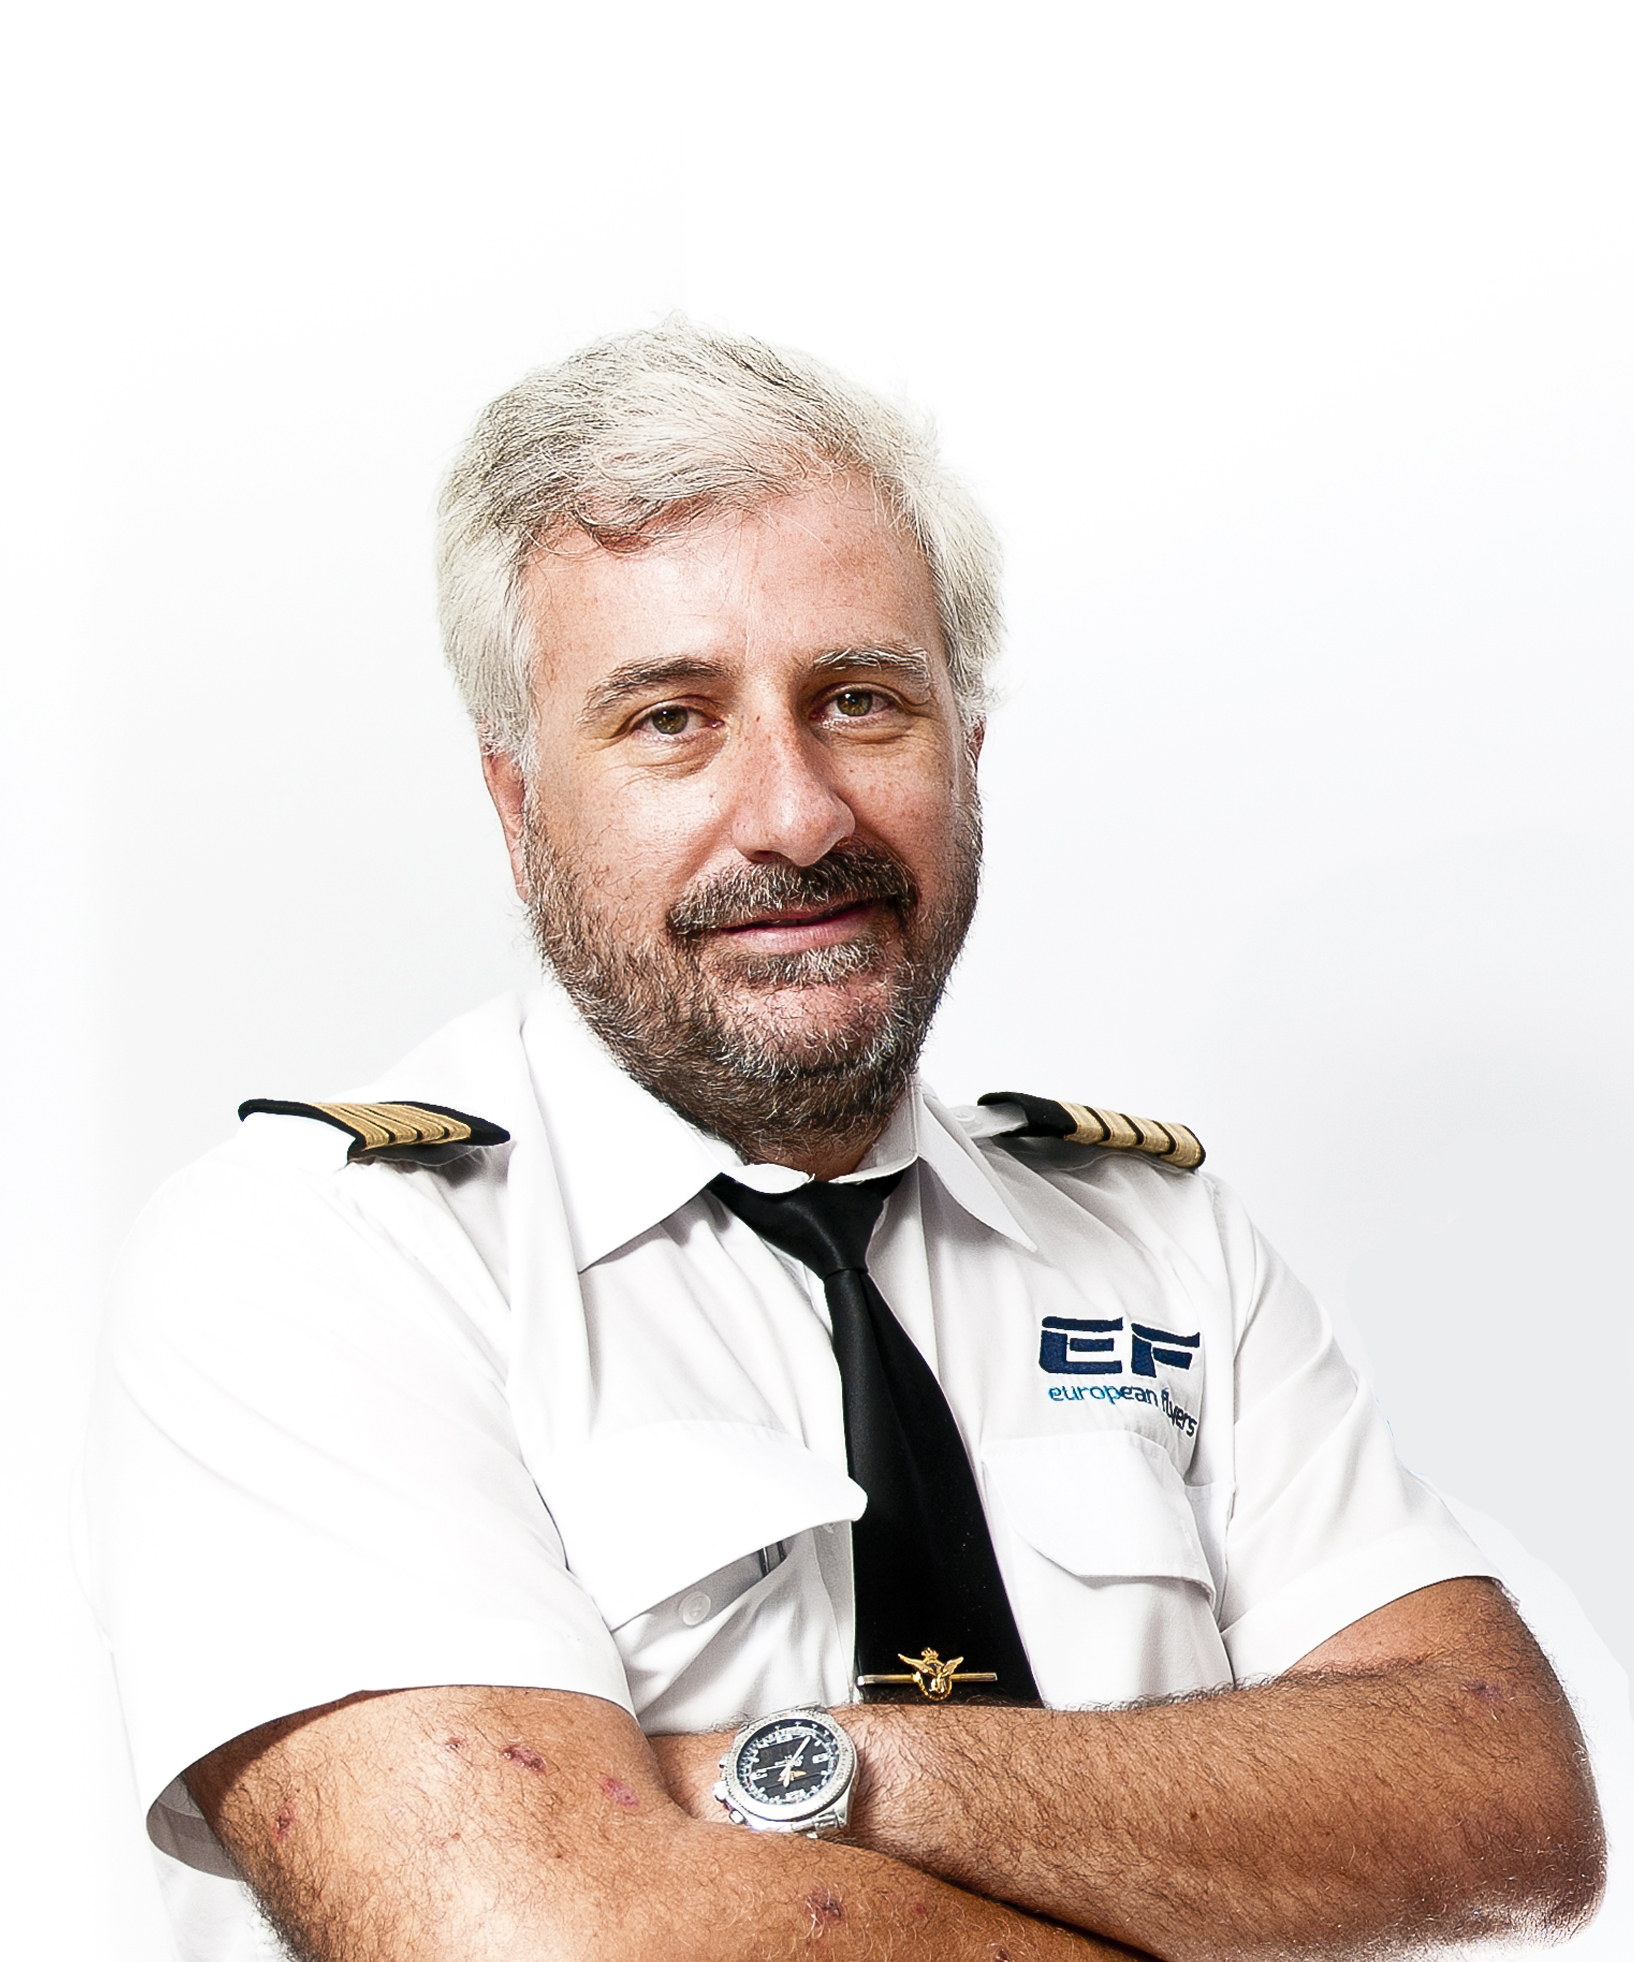 Oscar Díez, Jefe de pilotos de European Flyers